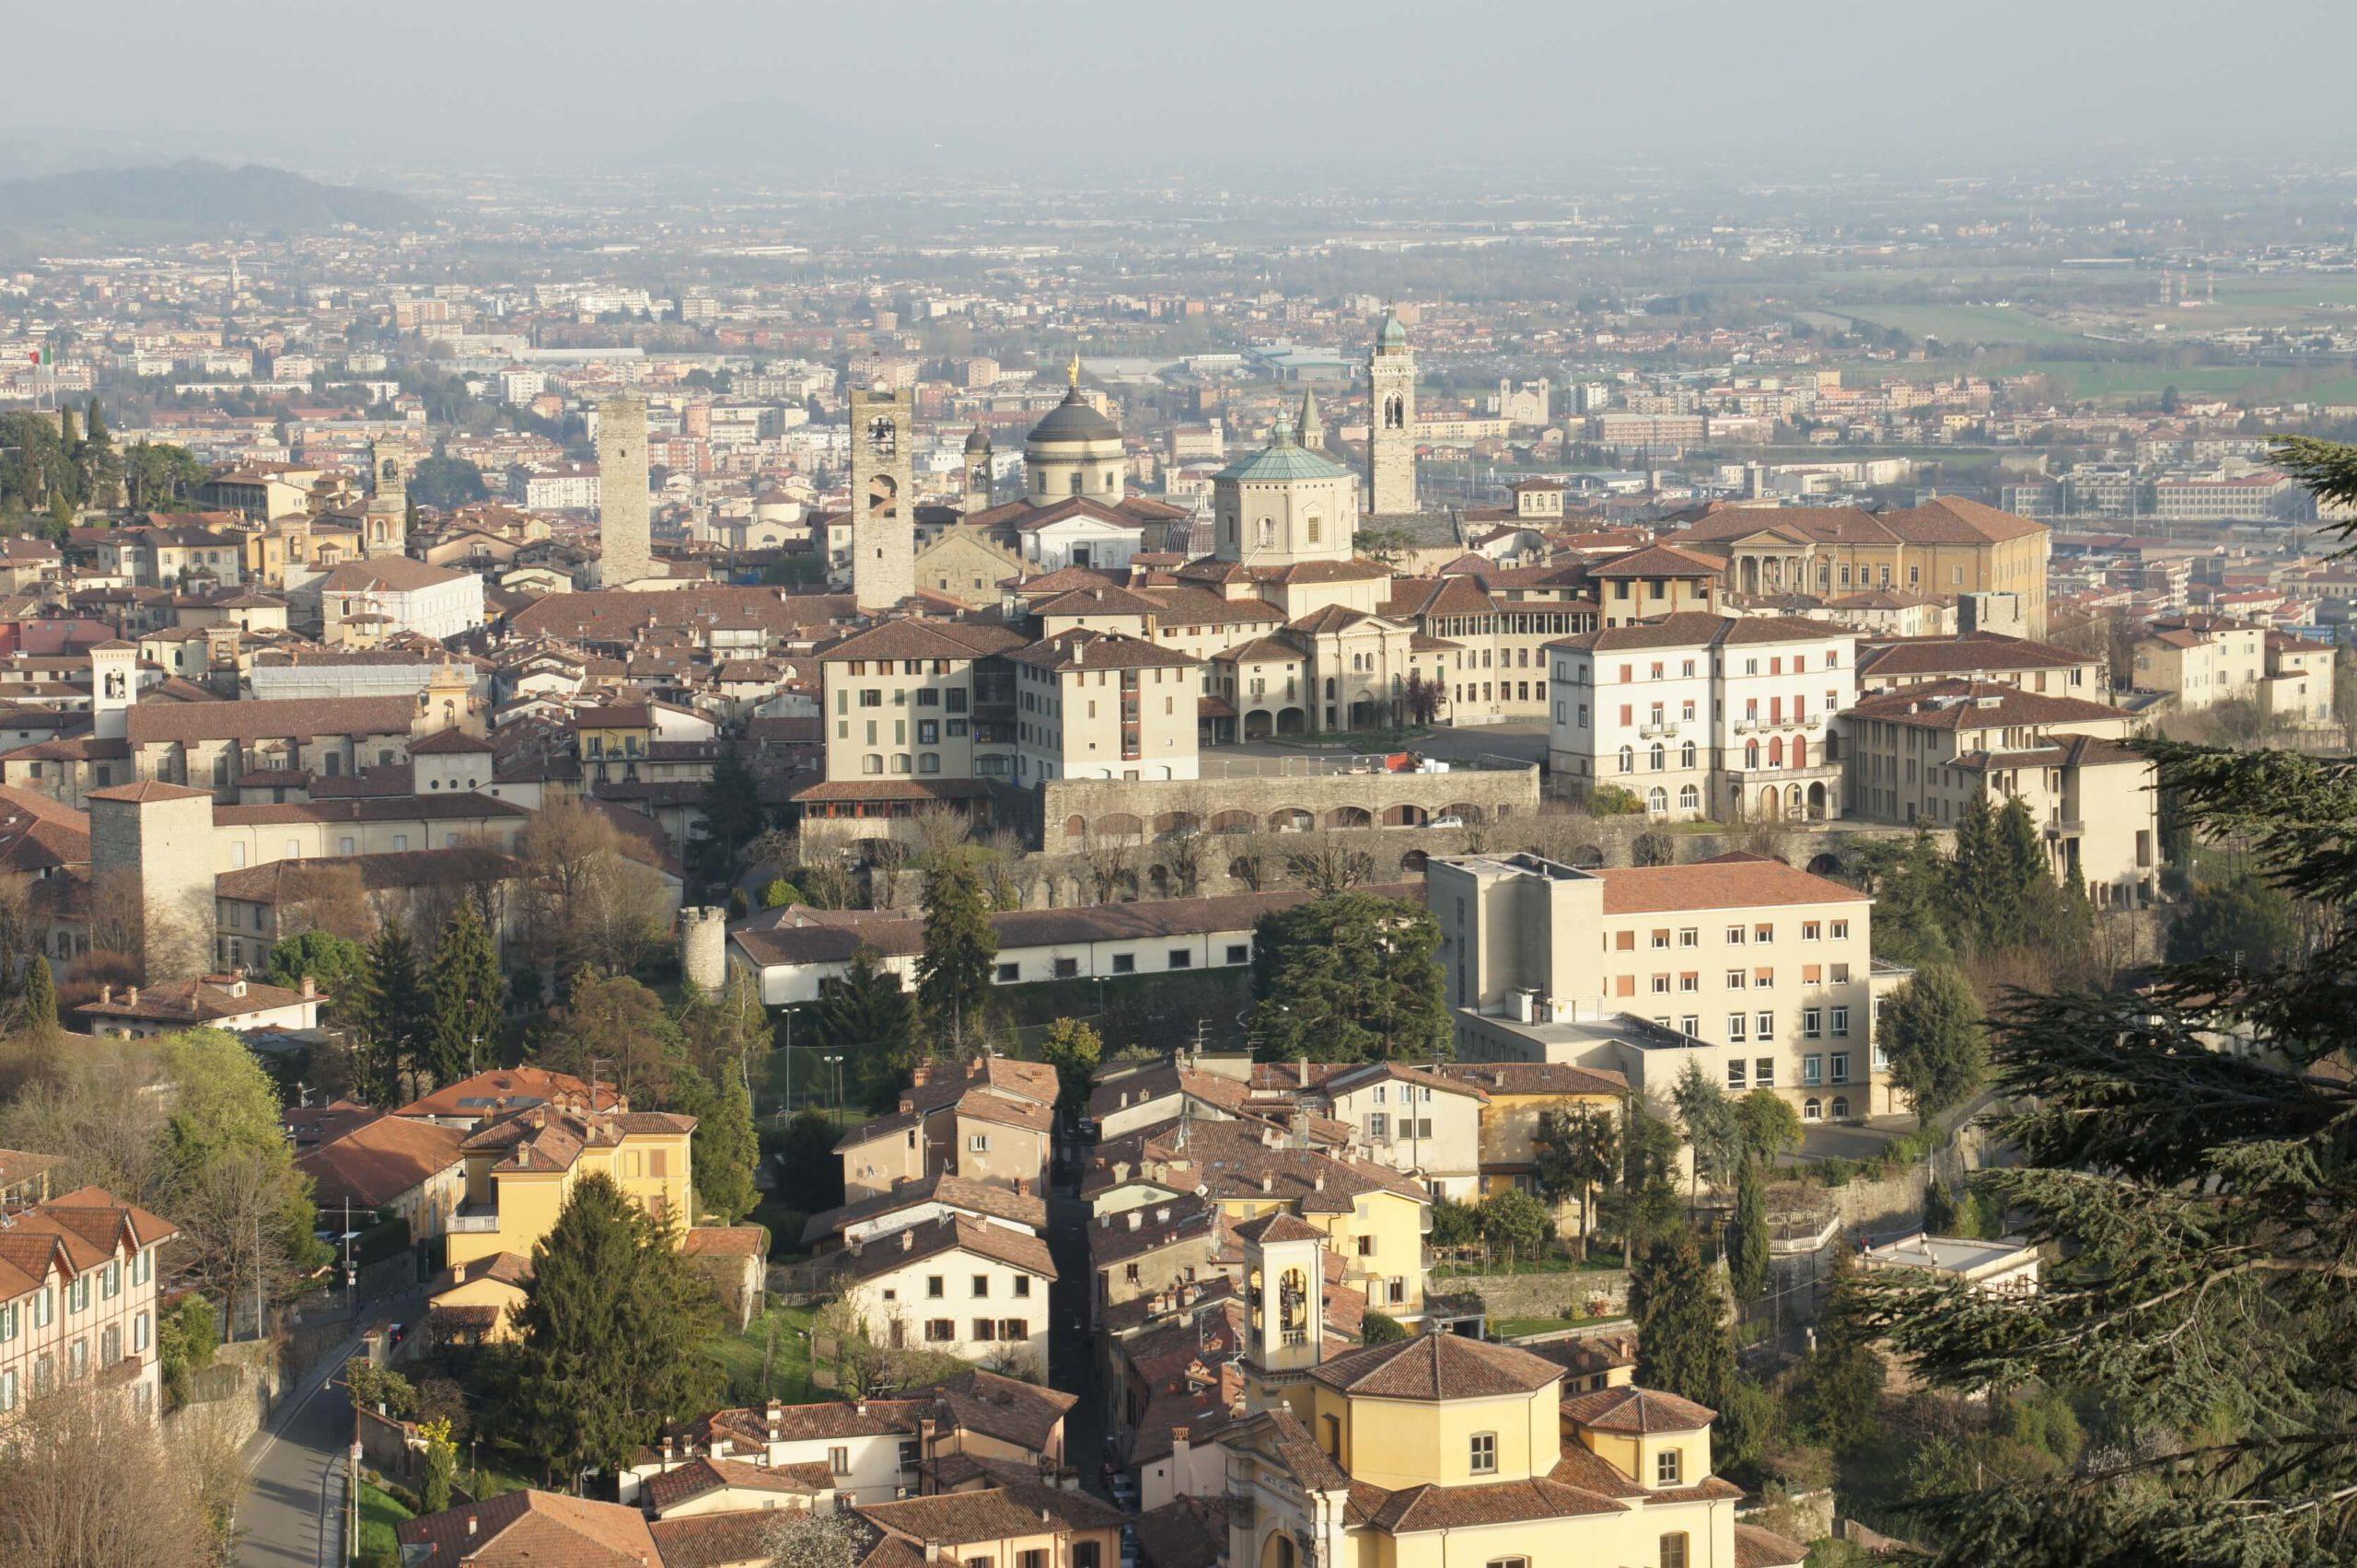 Bergamo and Crespi dAdda – Italy